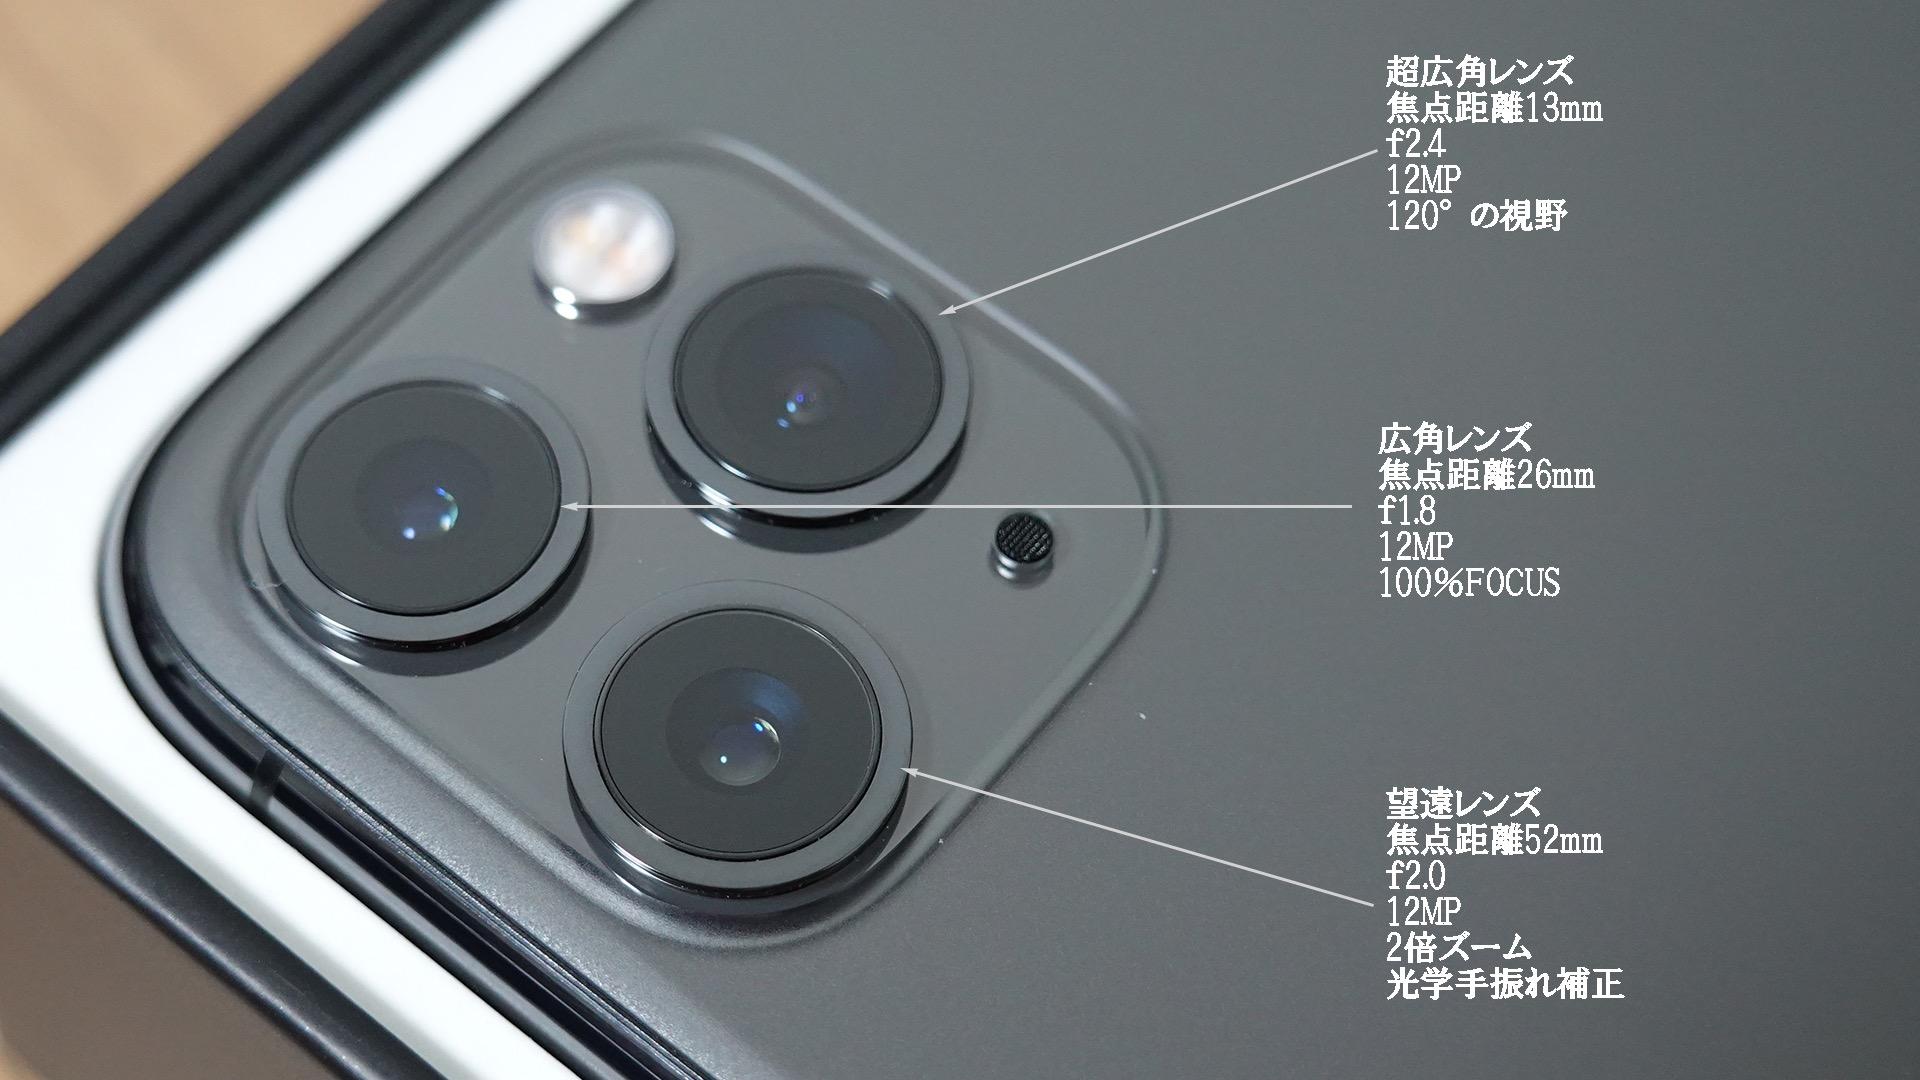 iPhone11ProMaxのカメラレンズ詳細